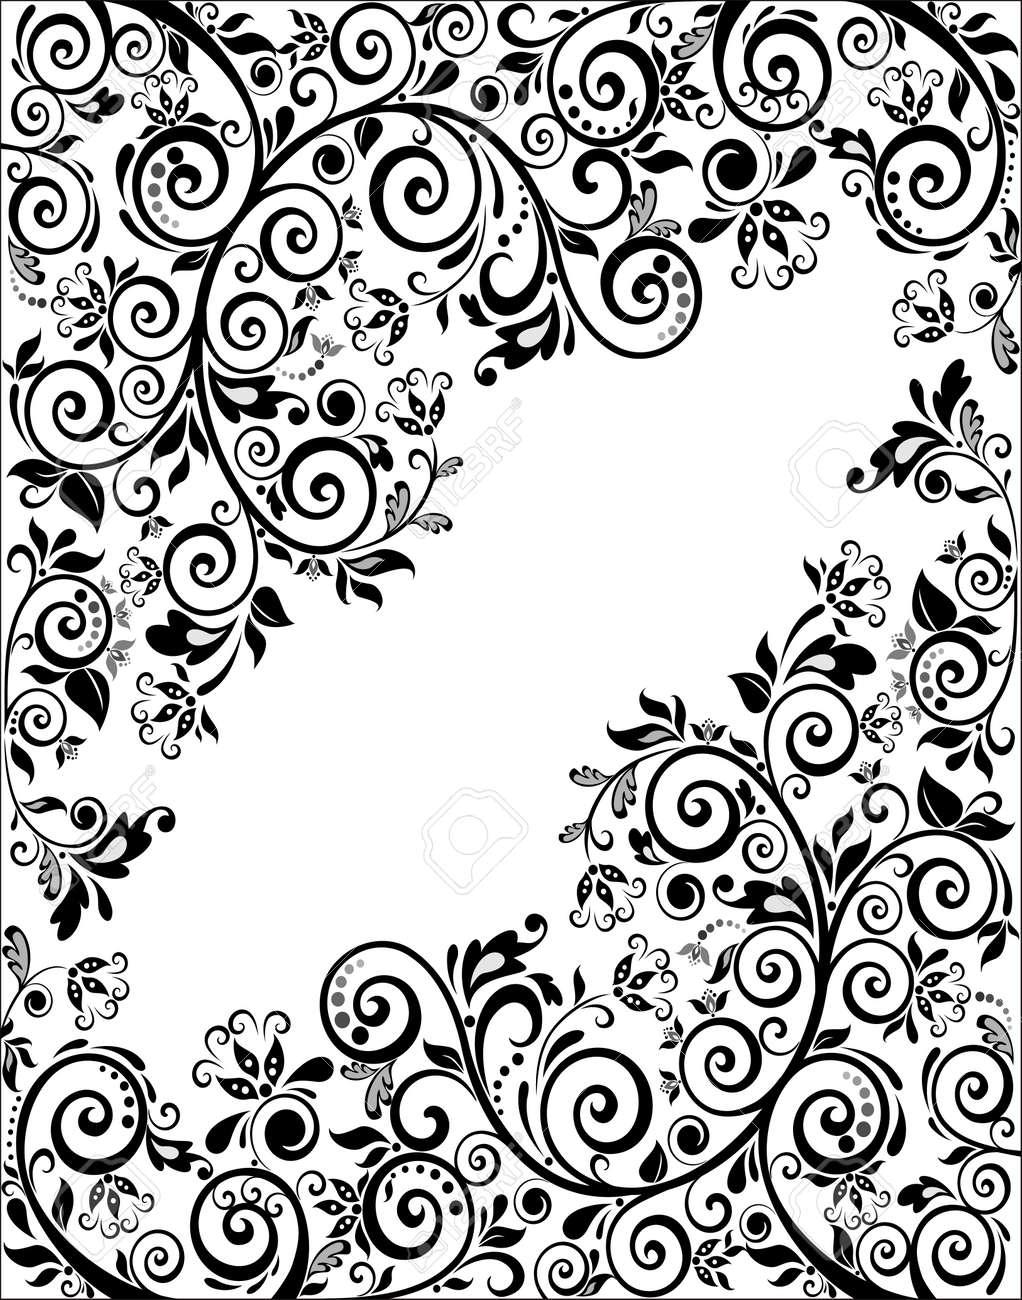 Damask Seamless Floral Pattern Royal Wallpaper Black Flowers